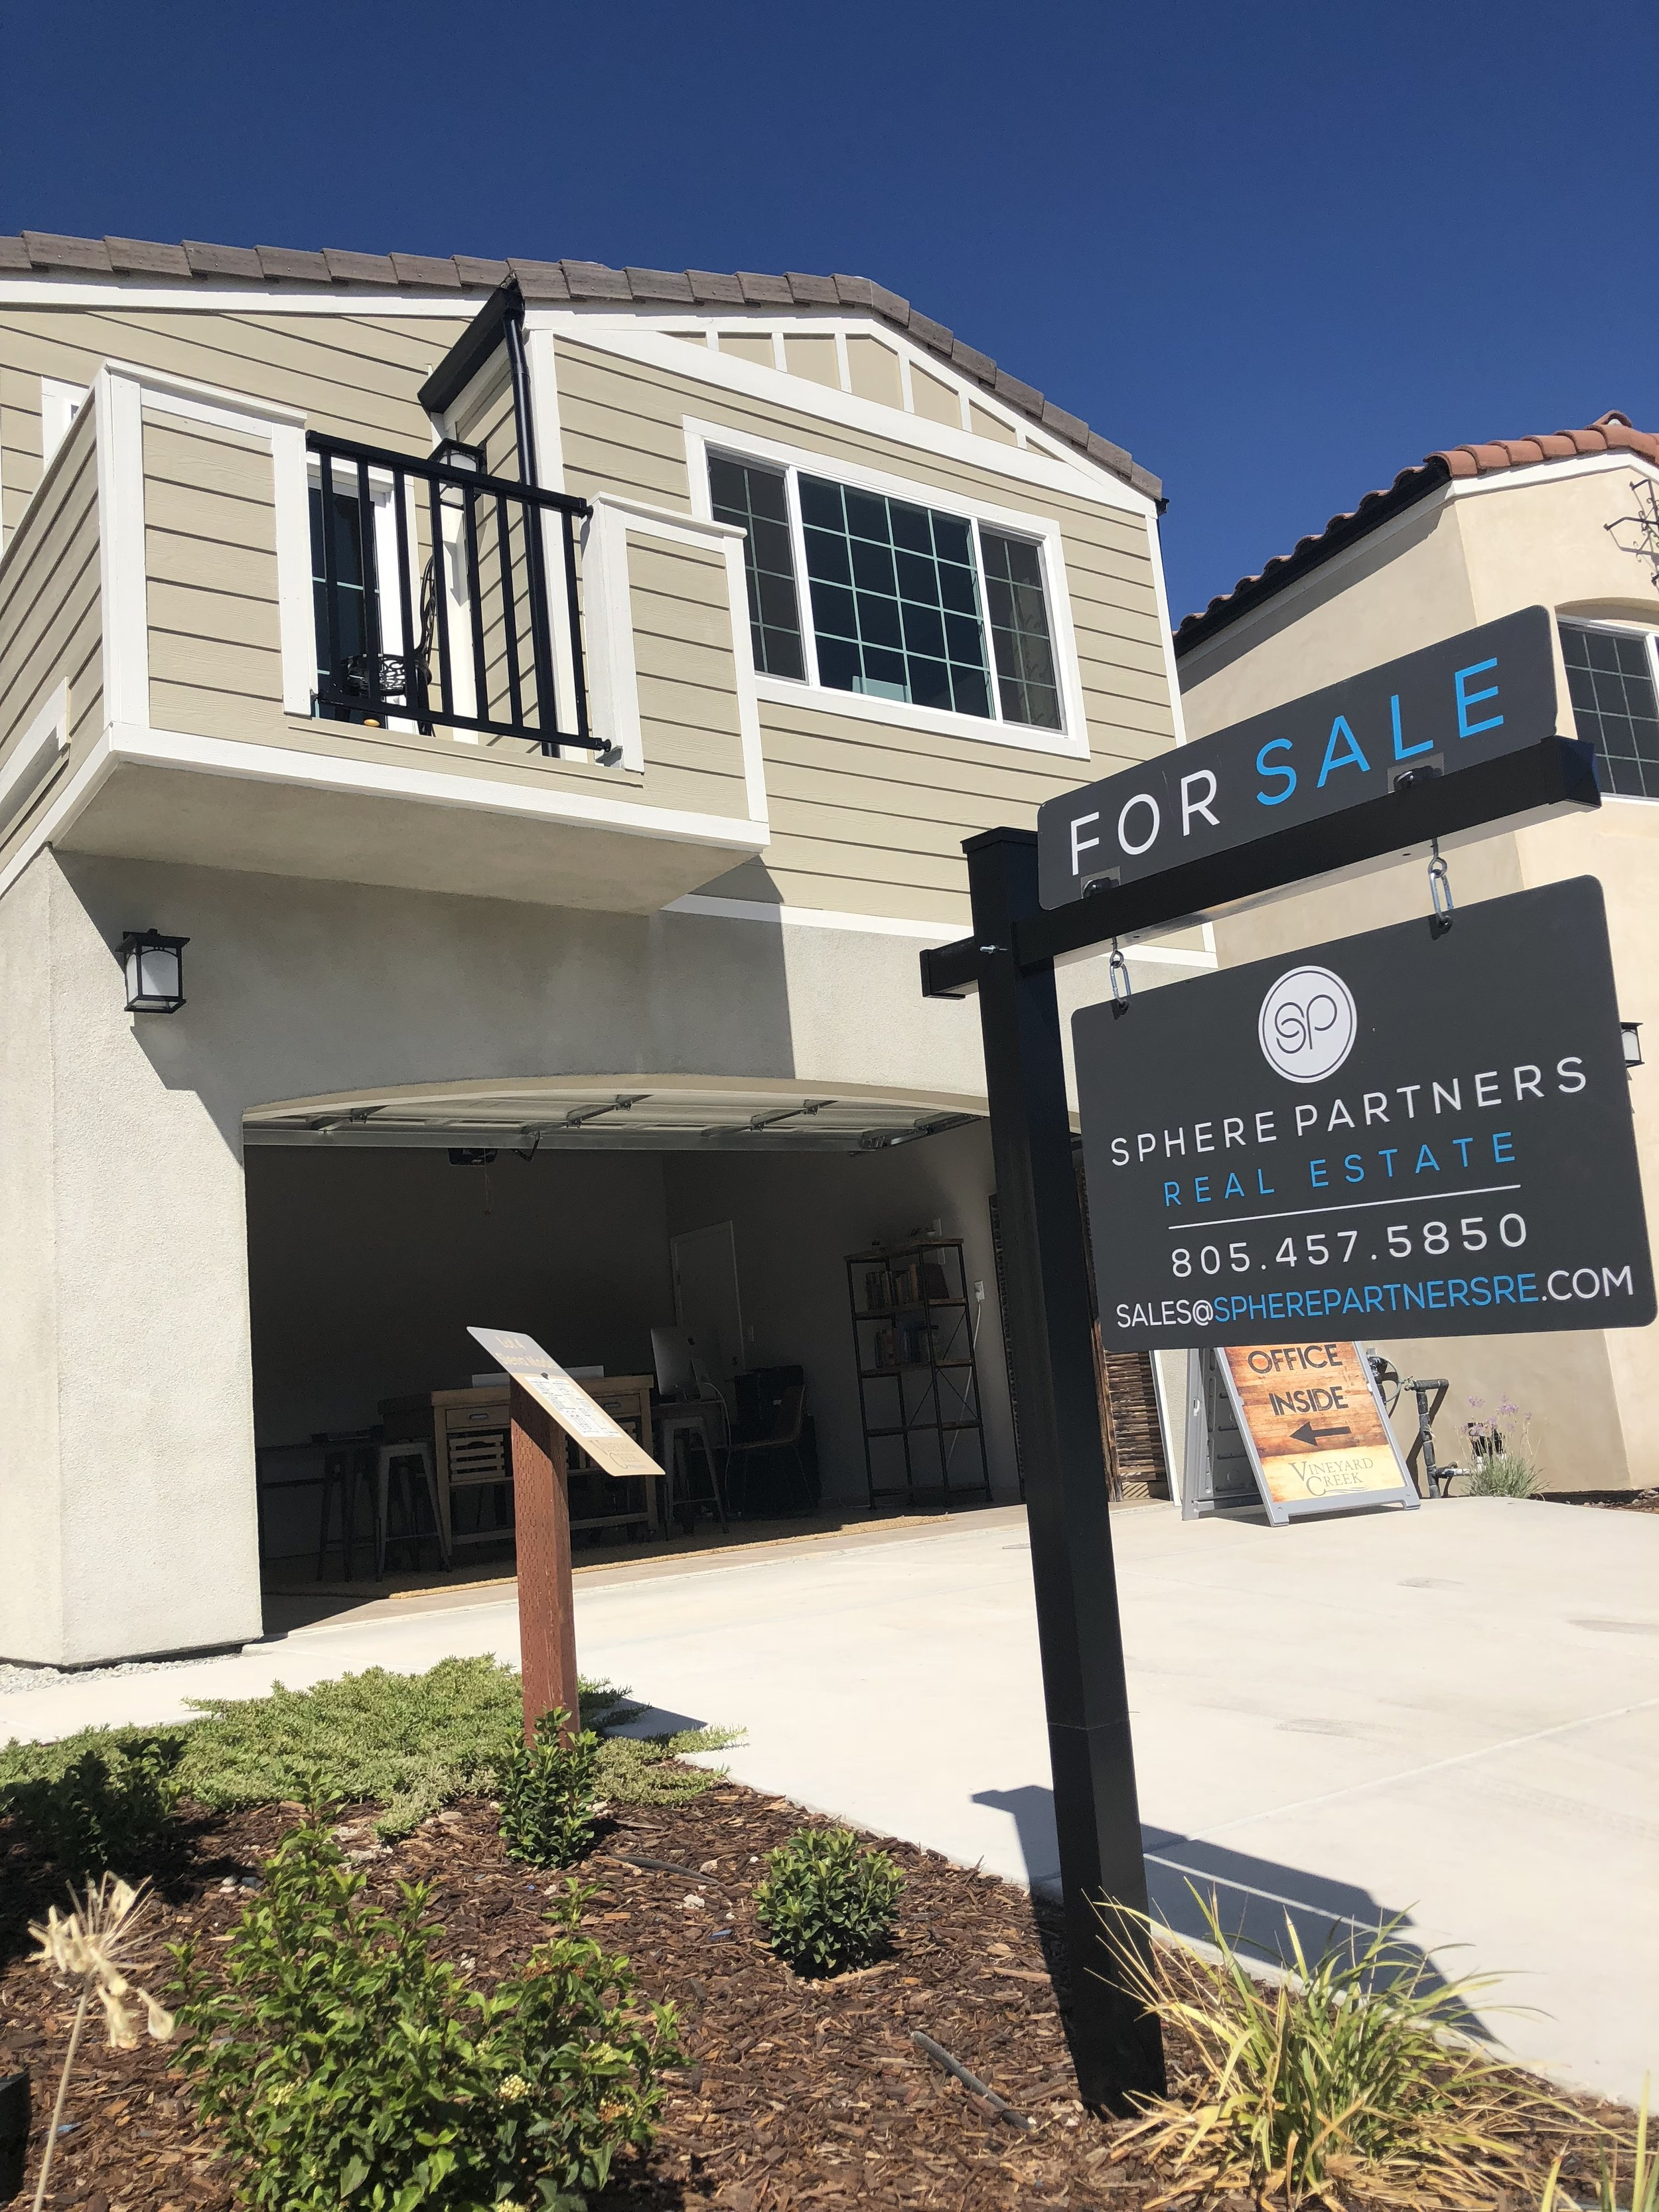 Current Homes Available - For Sale:283 Via Las Casitas, Templeton CA, 93465287 Via Las Casitas, Templeton CA, 93465291 Via Las Casitas, Tempelton CA, 93465